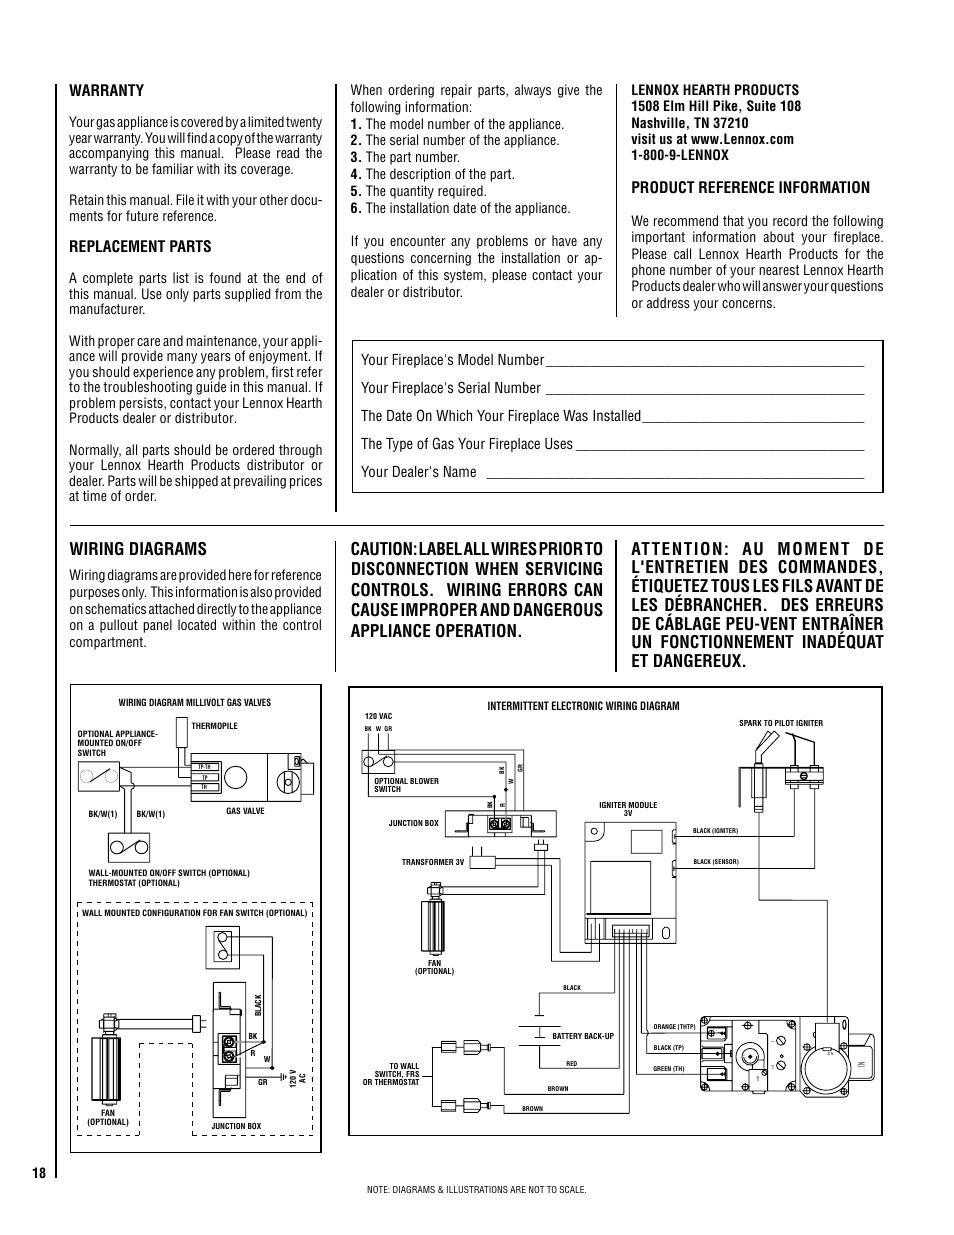 wiring diagram for lennox 89n18